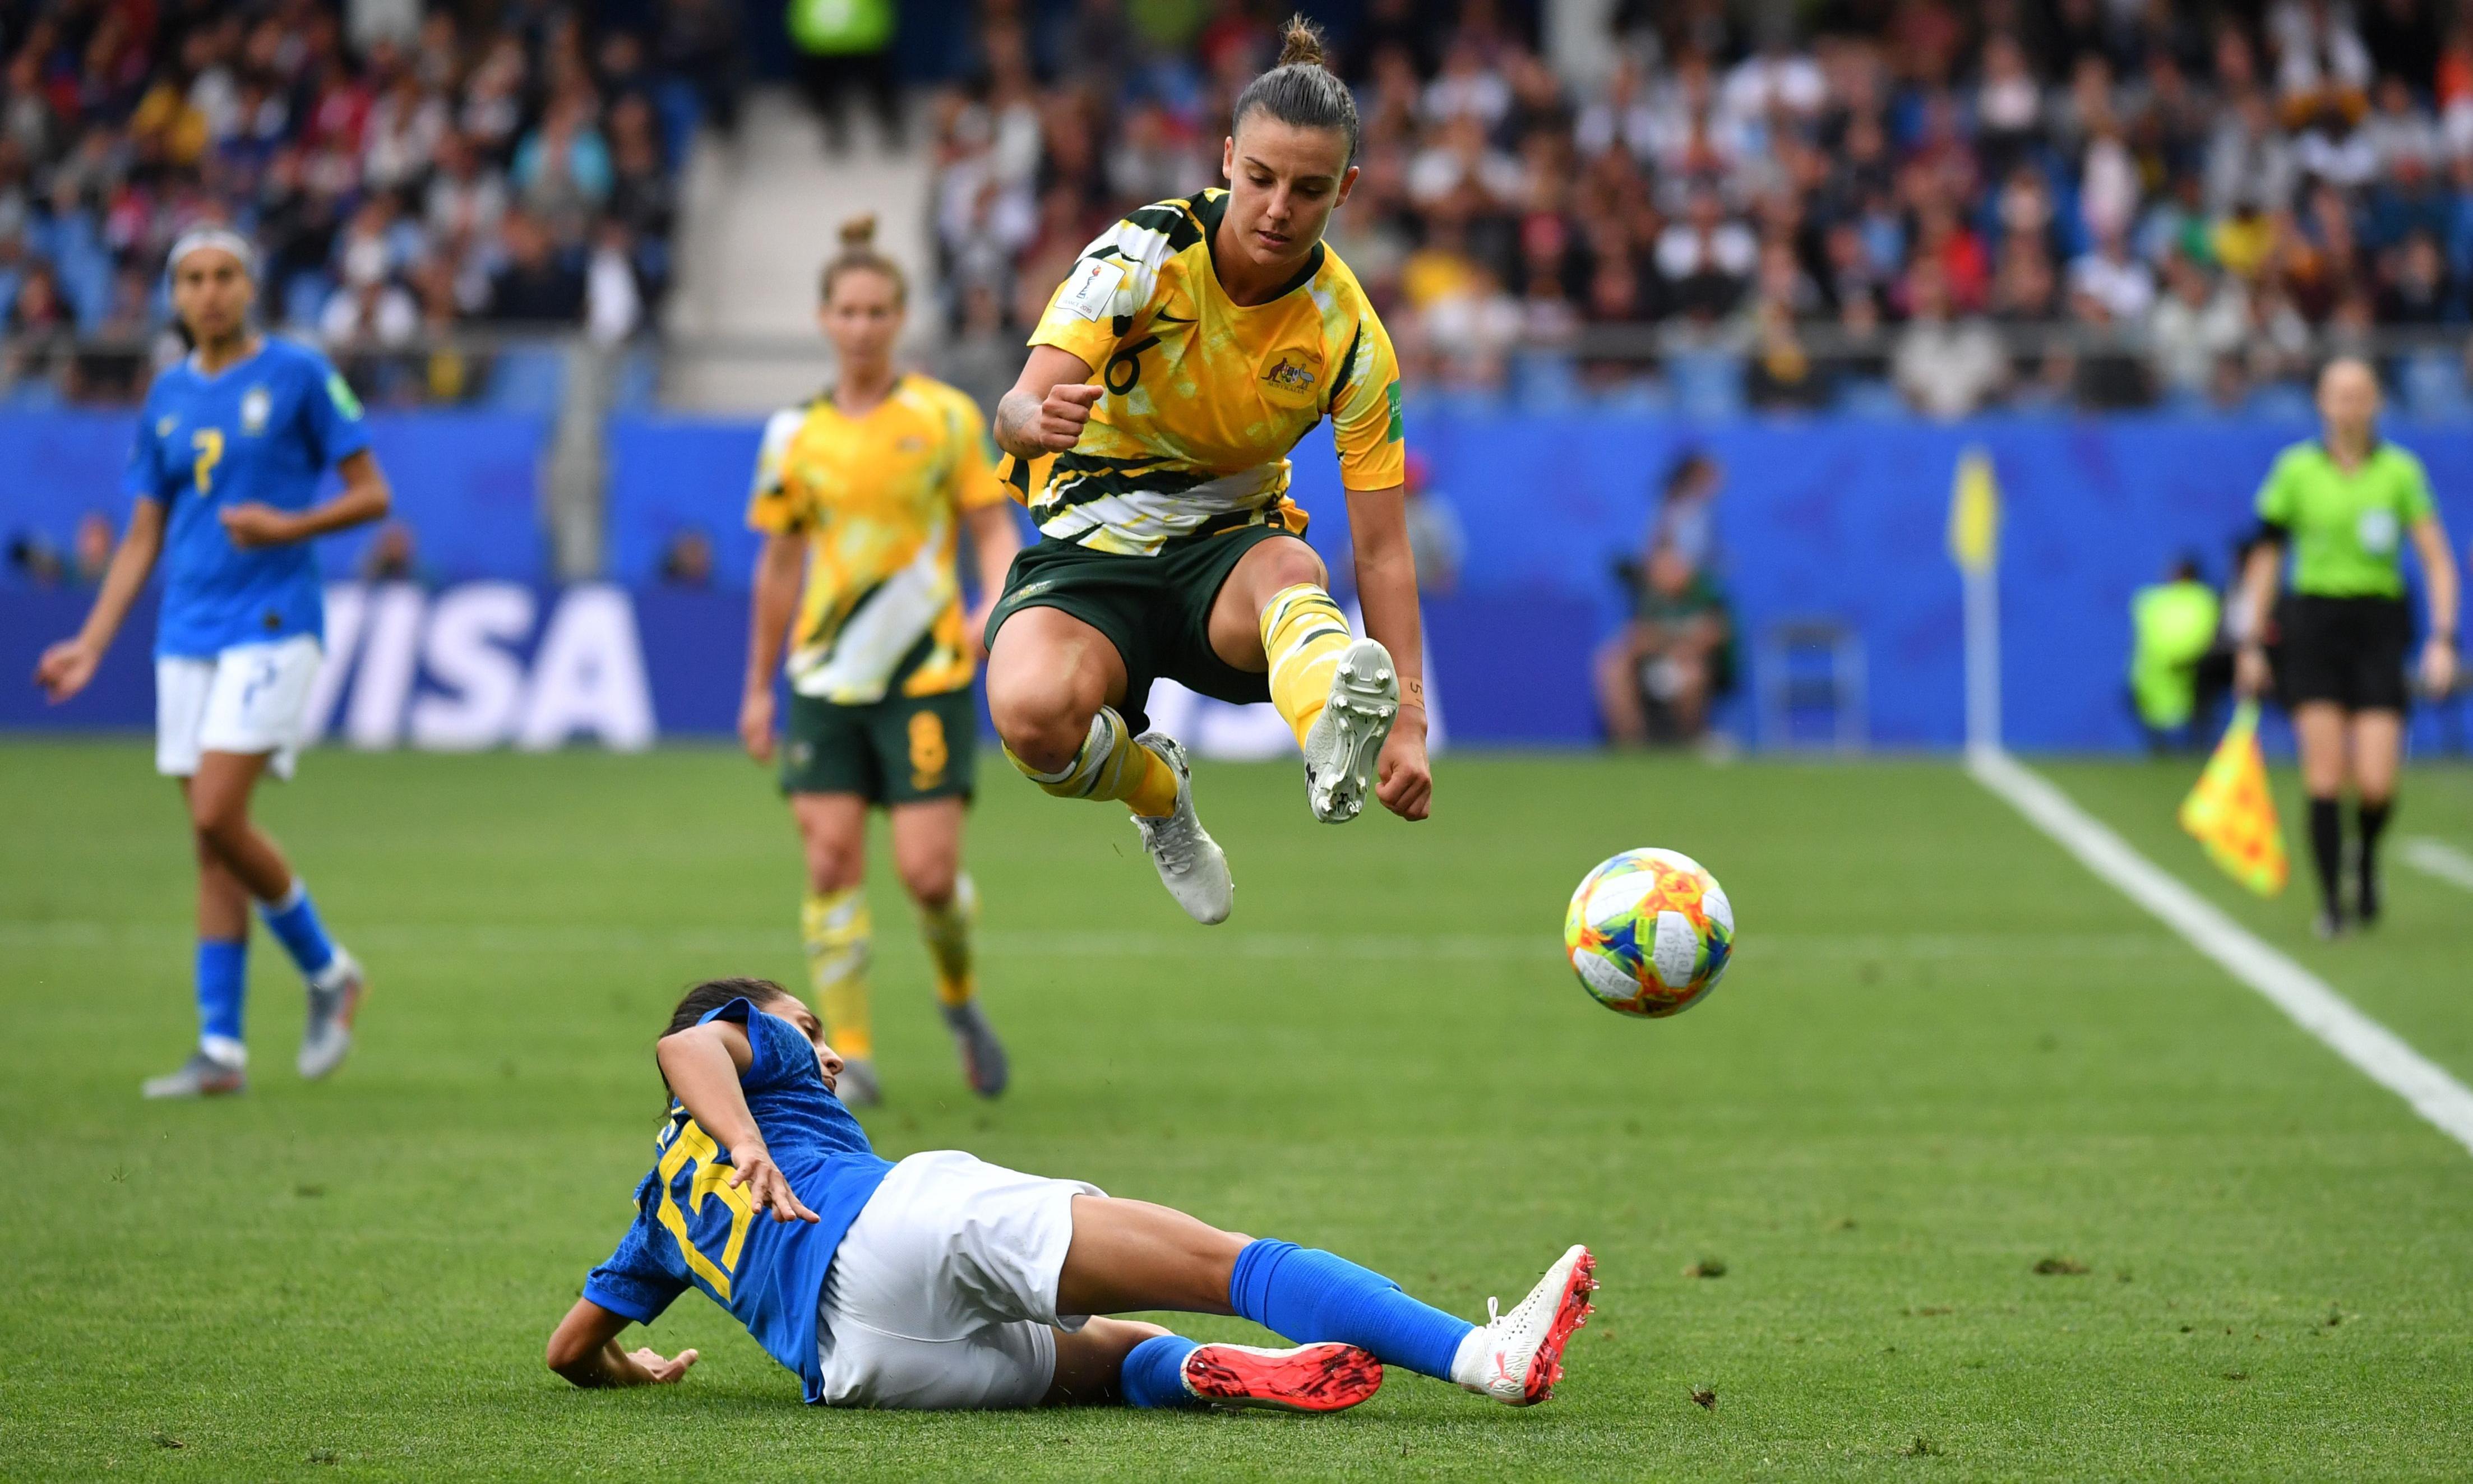 Women's football has come a long way but misogyny is still not beaten